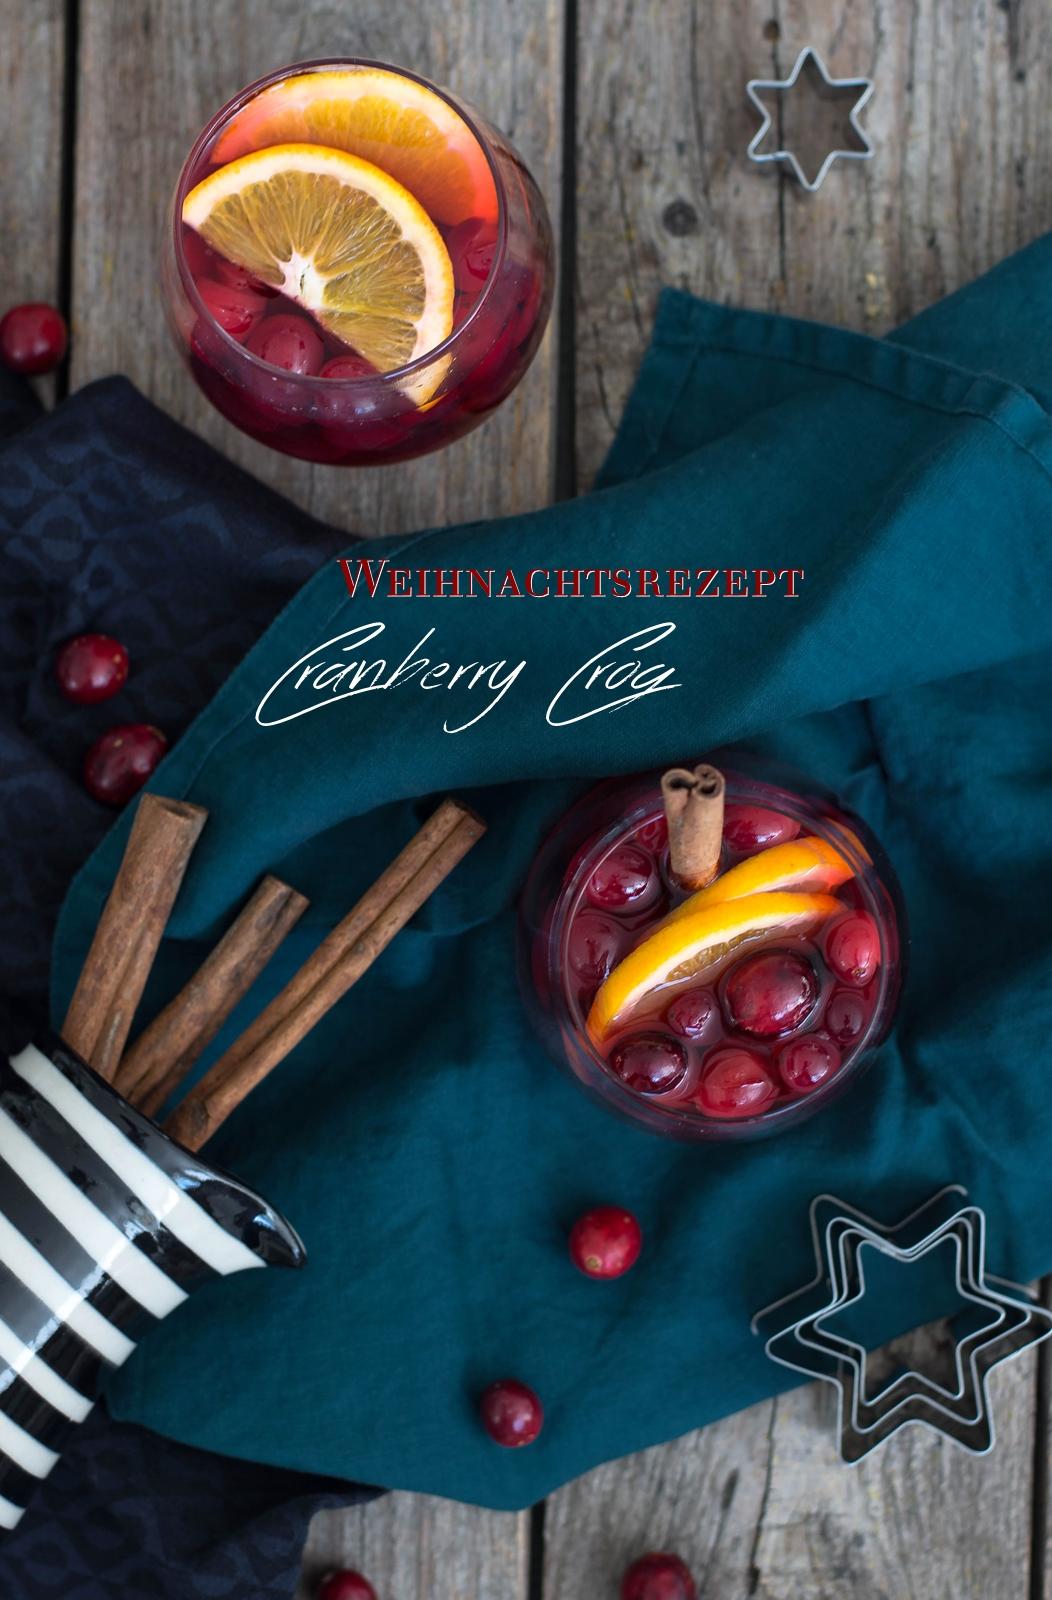 Winterrezept: Cranberry Crog